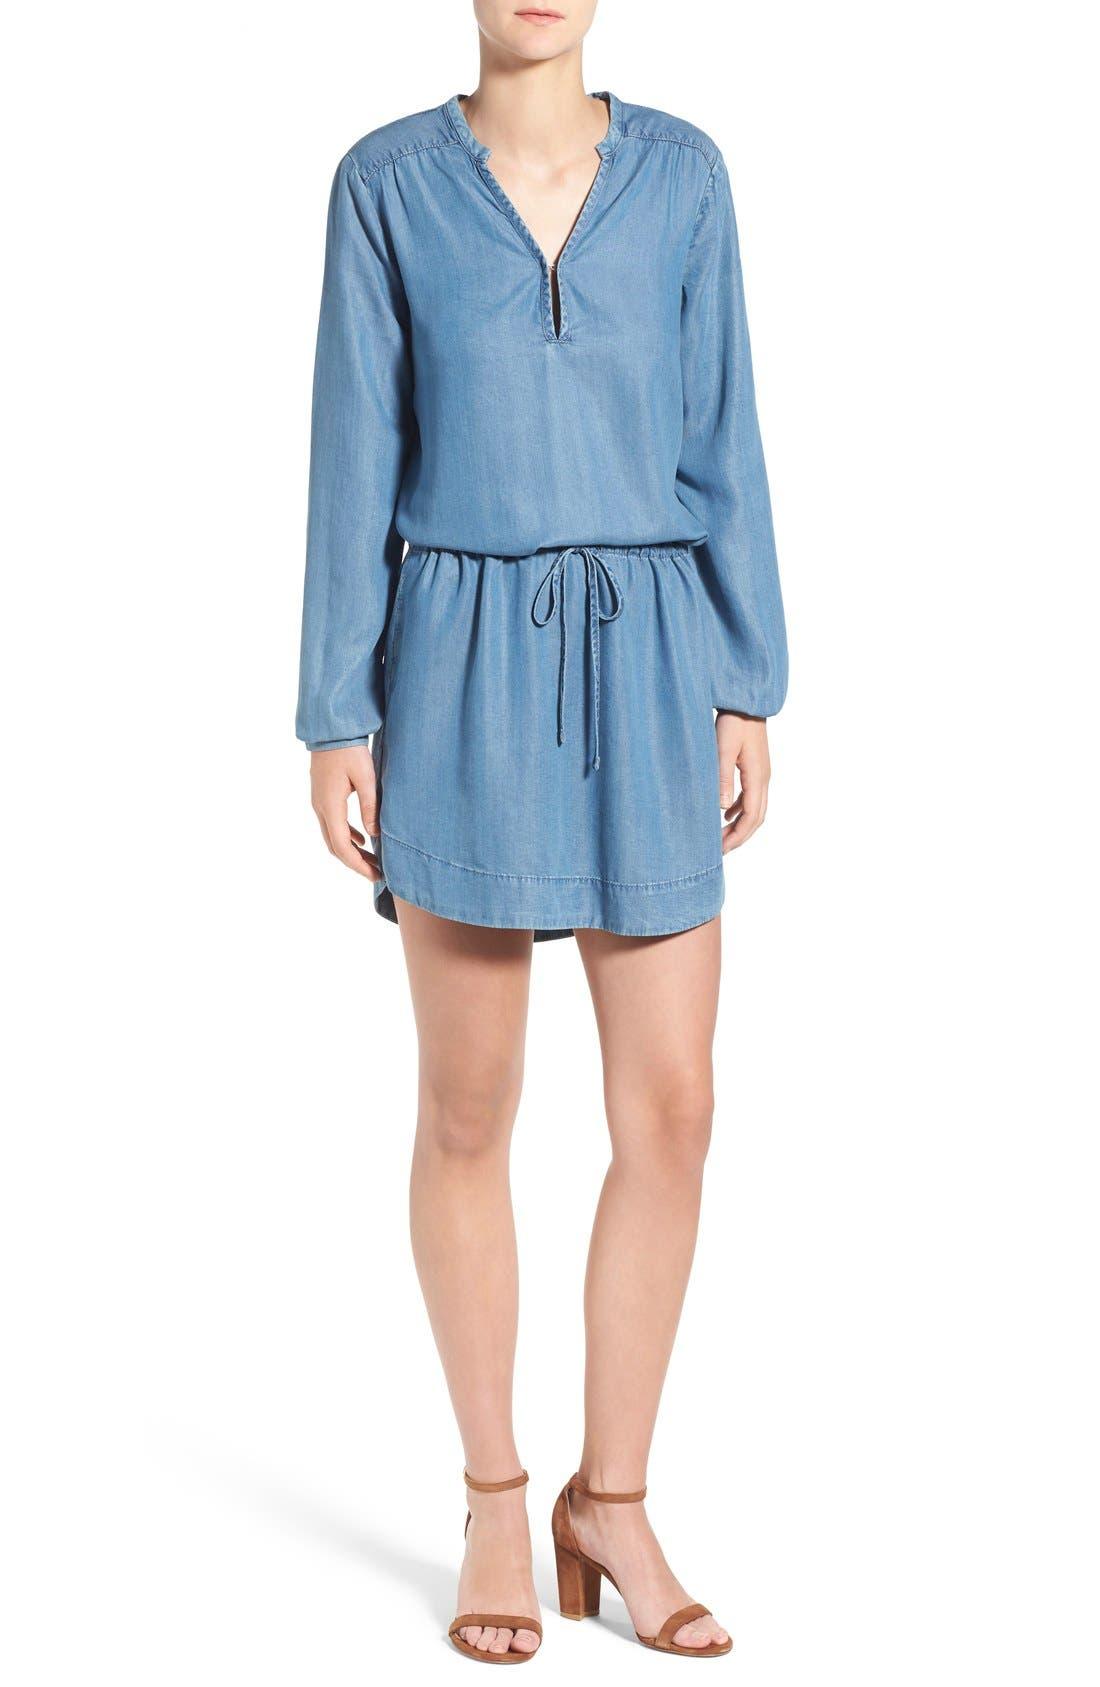 'Quianna' Chambray Tunic Dress, Main, color, 400